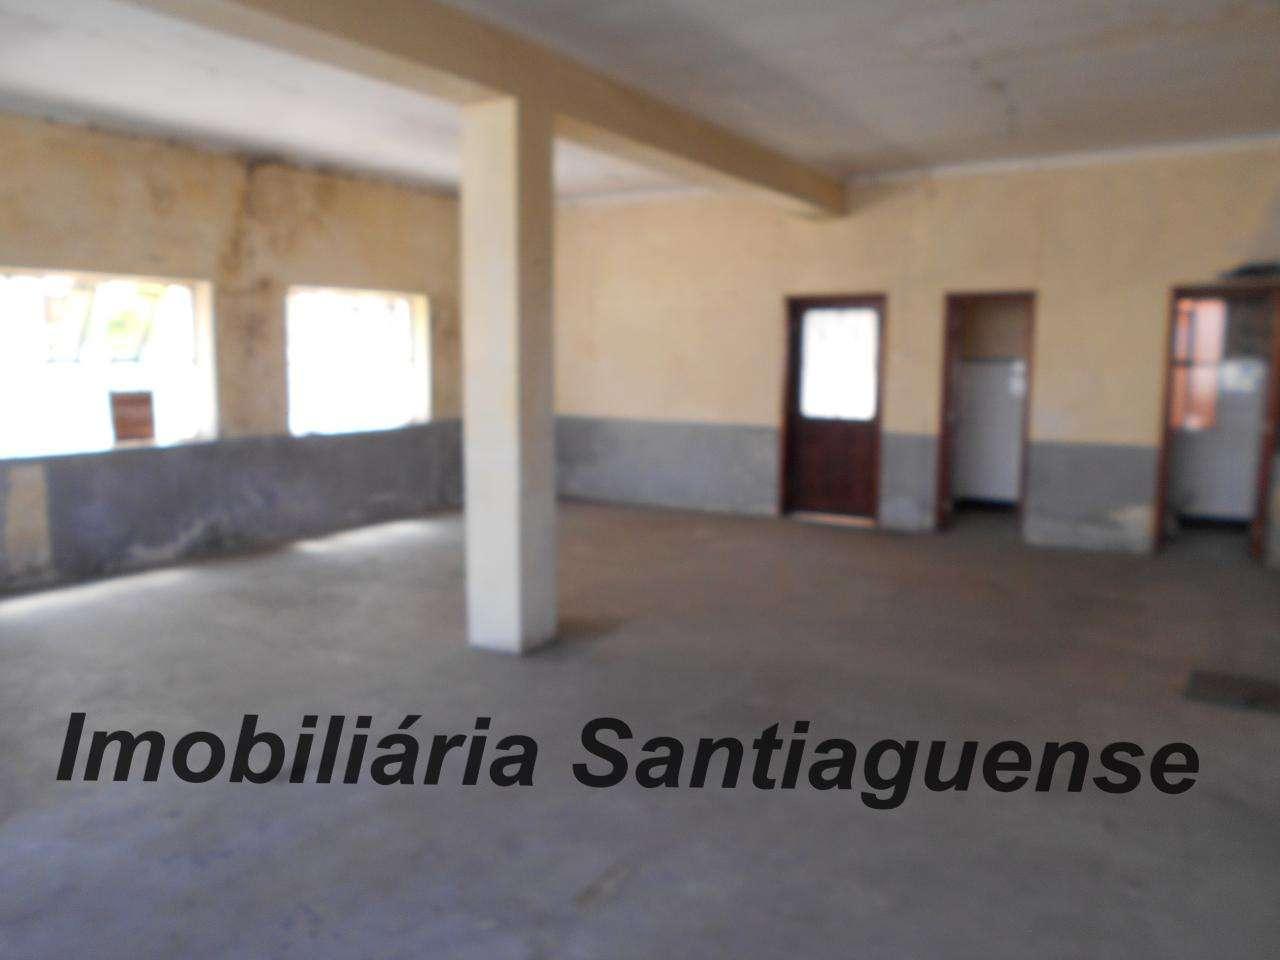 Loja para arrendar, Oliveira de Azeméis, Santiago de Riba-Ul, Ul, Macinhata da Seixa e Madail, Oliveira de Azeméis, Aveiro - Foto 2